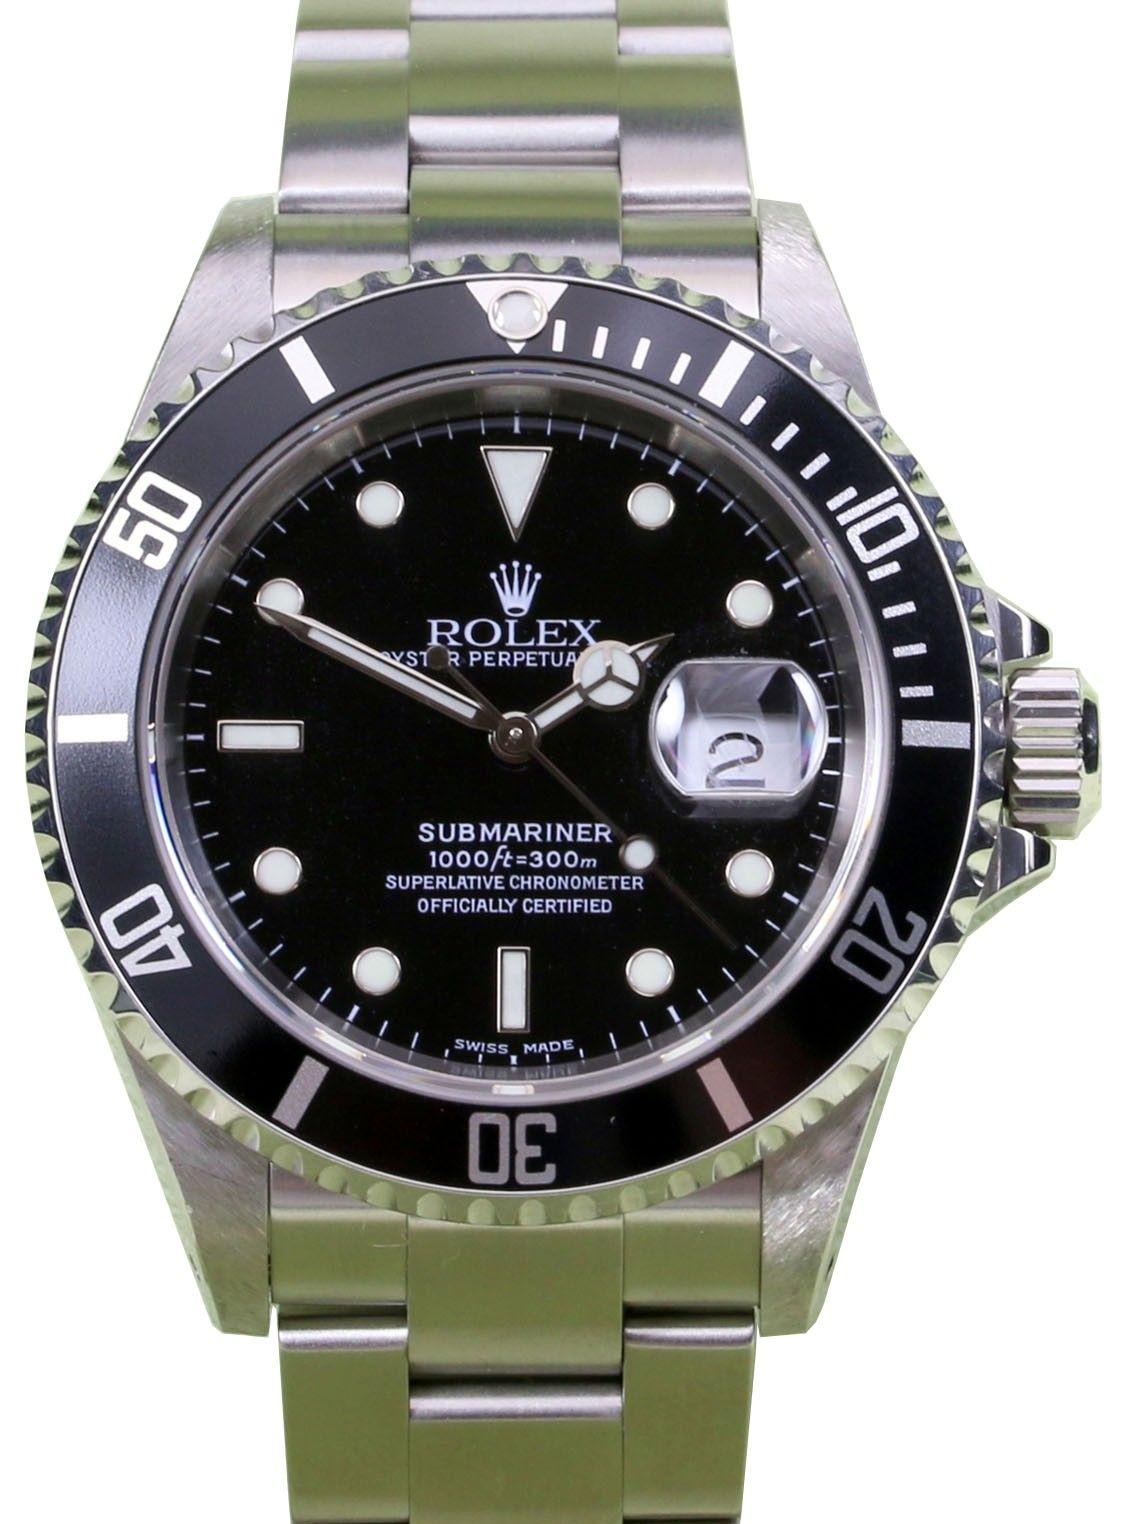 Rolex 16610 Submariner Black For Sale Rolex Submariner 16610 Rolex Submariner Rolex